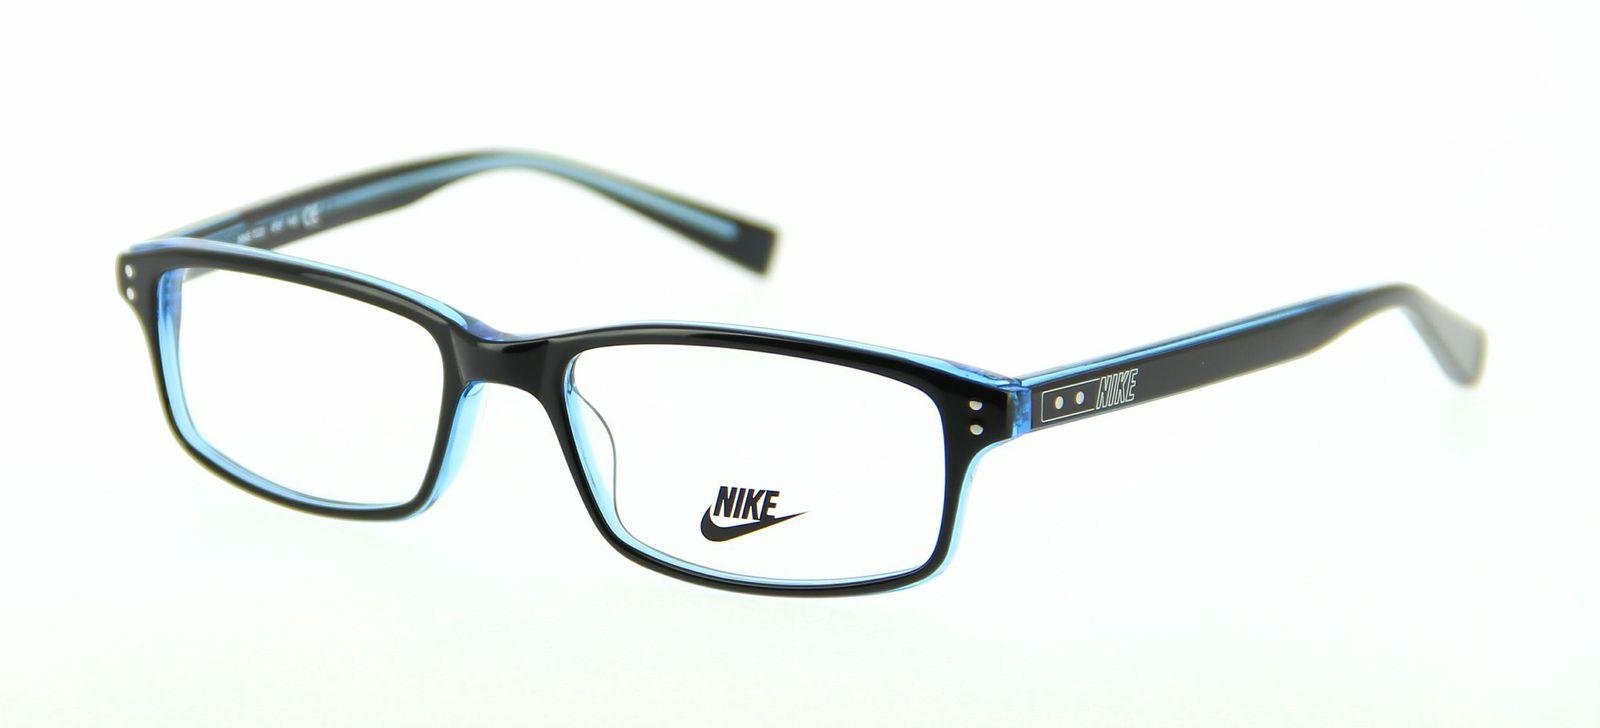 NikeMens4.jpg